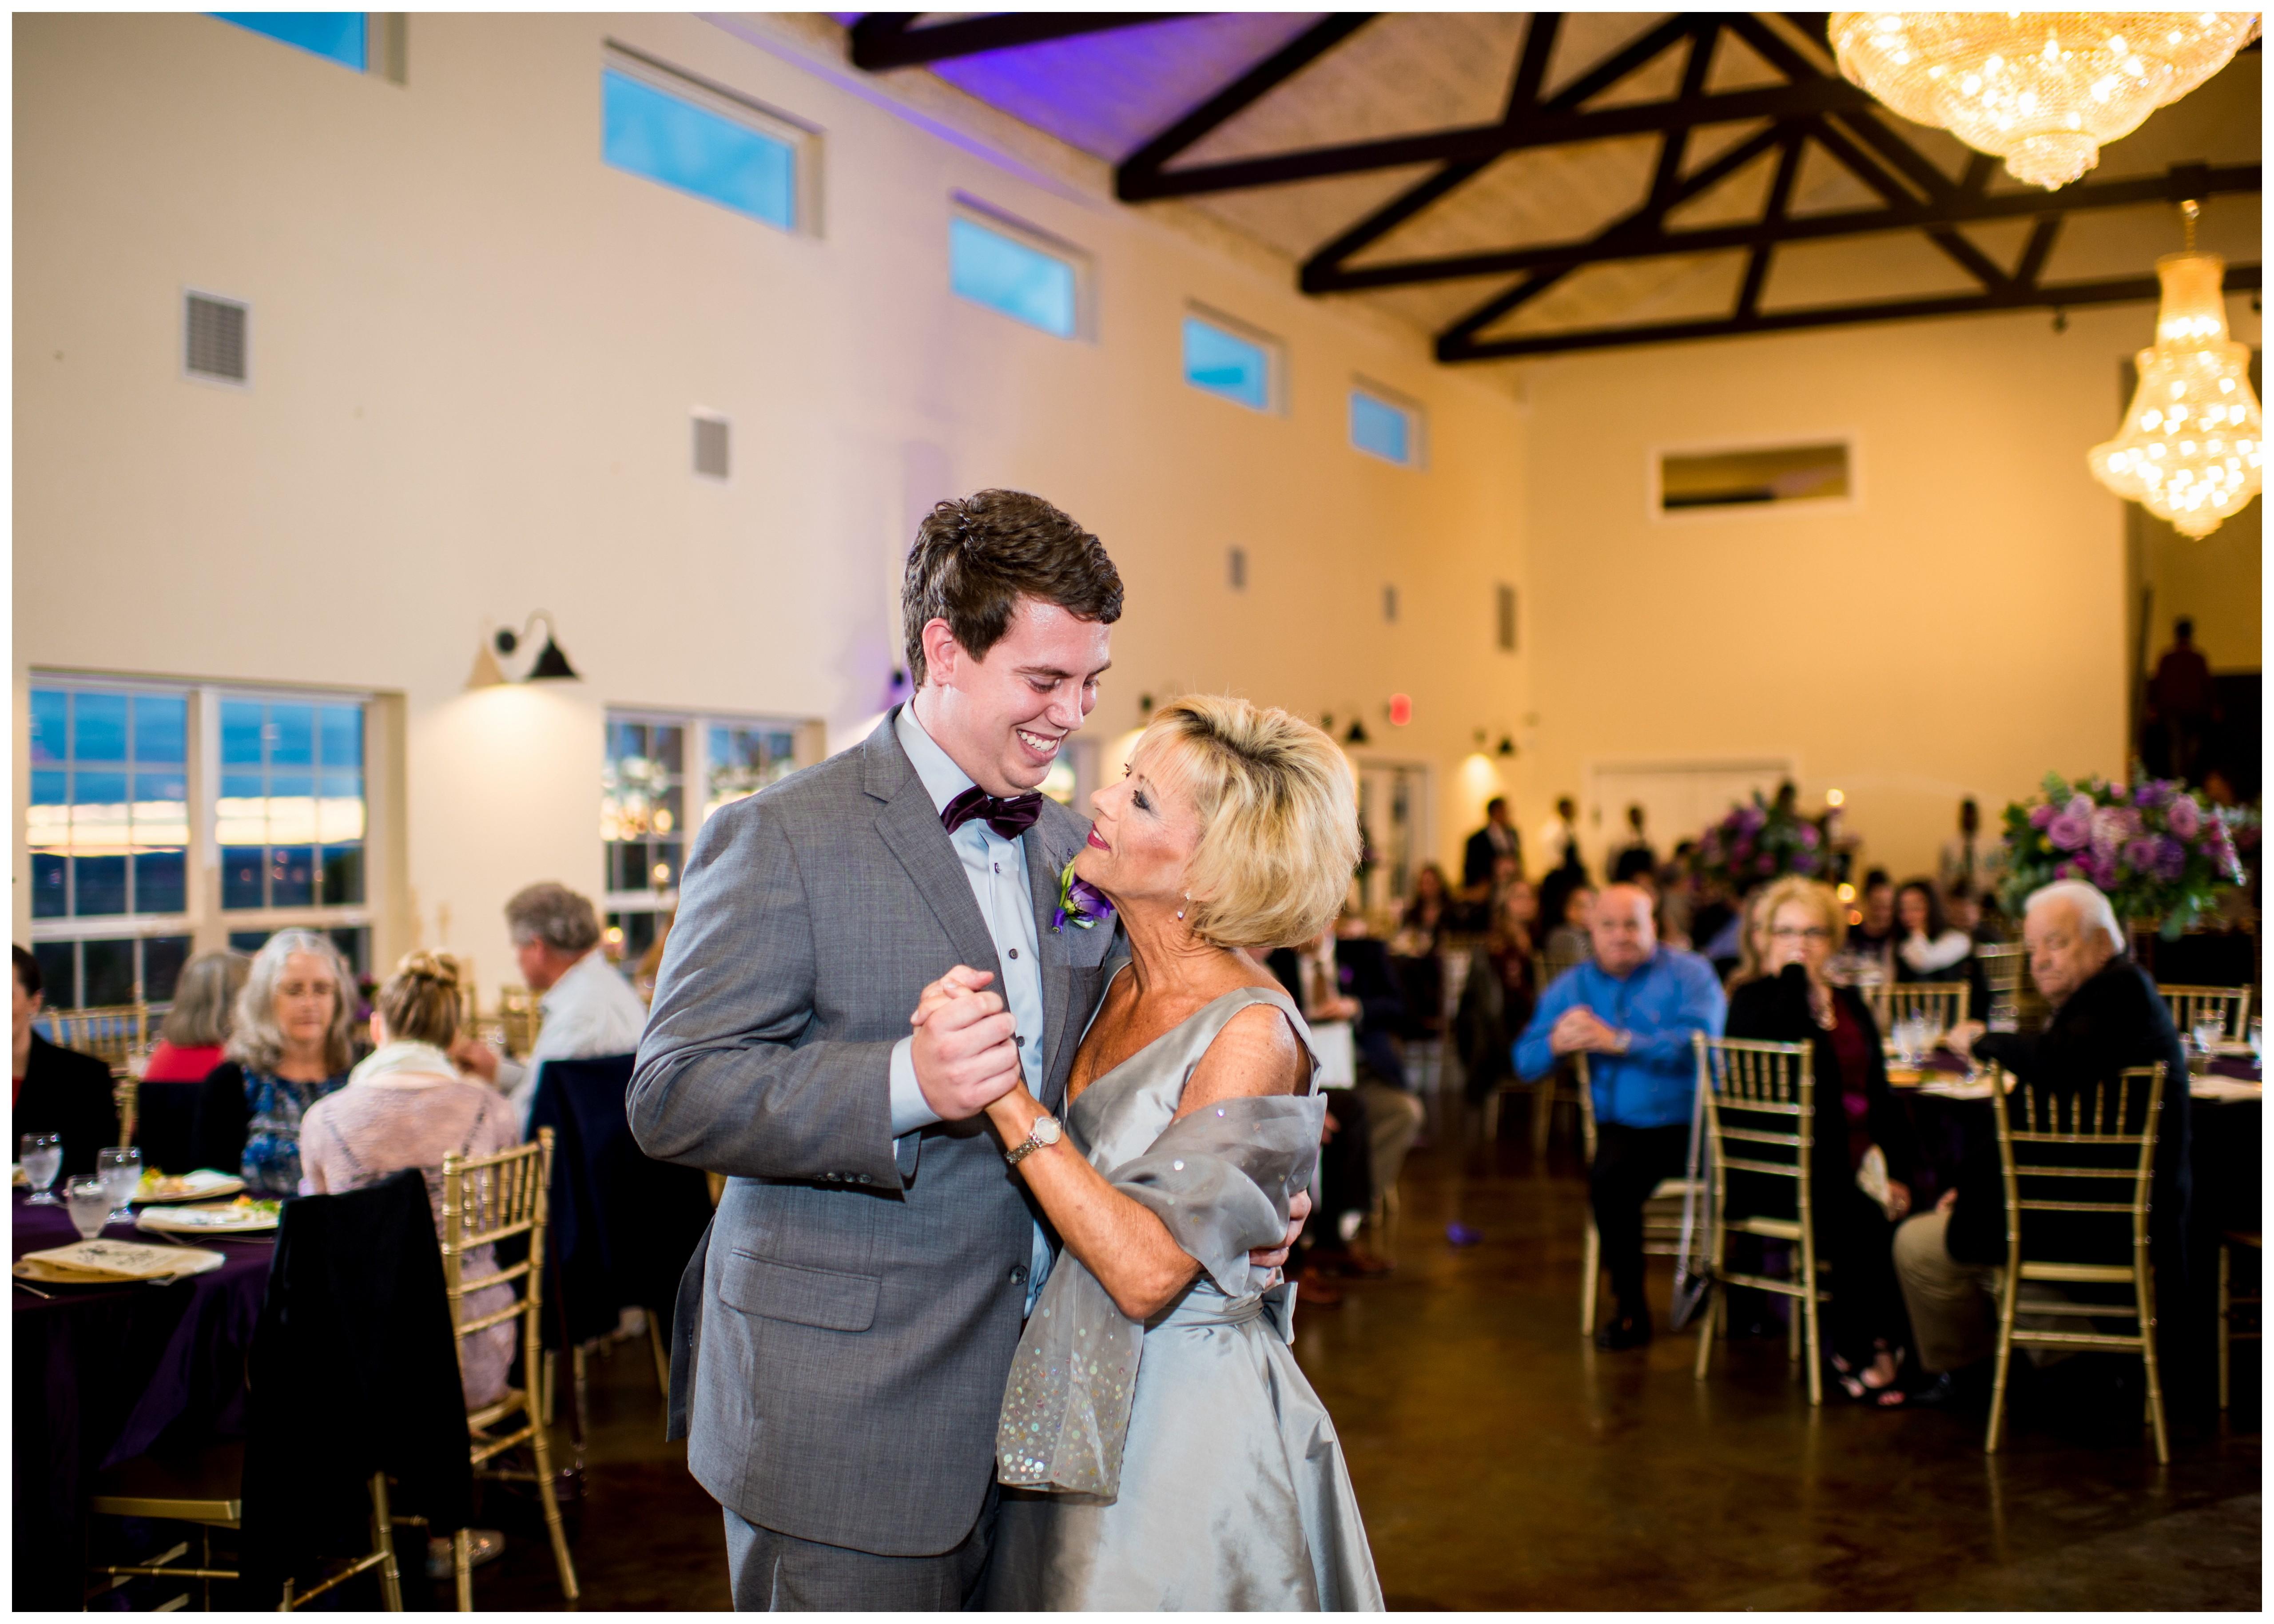 LIVE_FINAL_WEDDING_WESLEY_SARAH_JO10